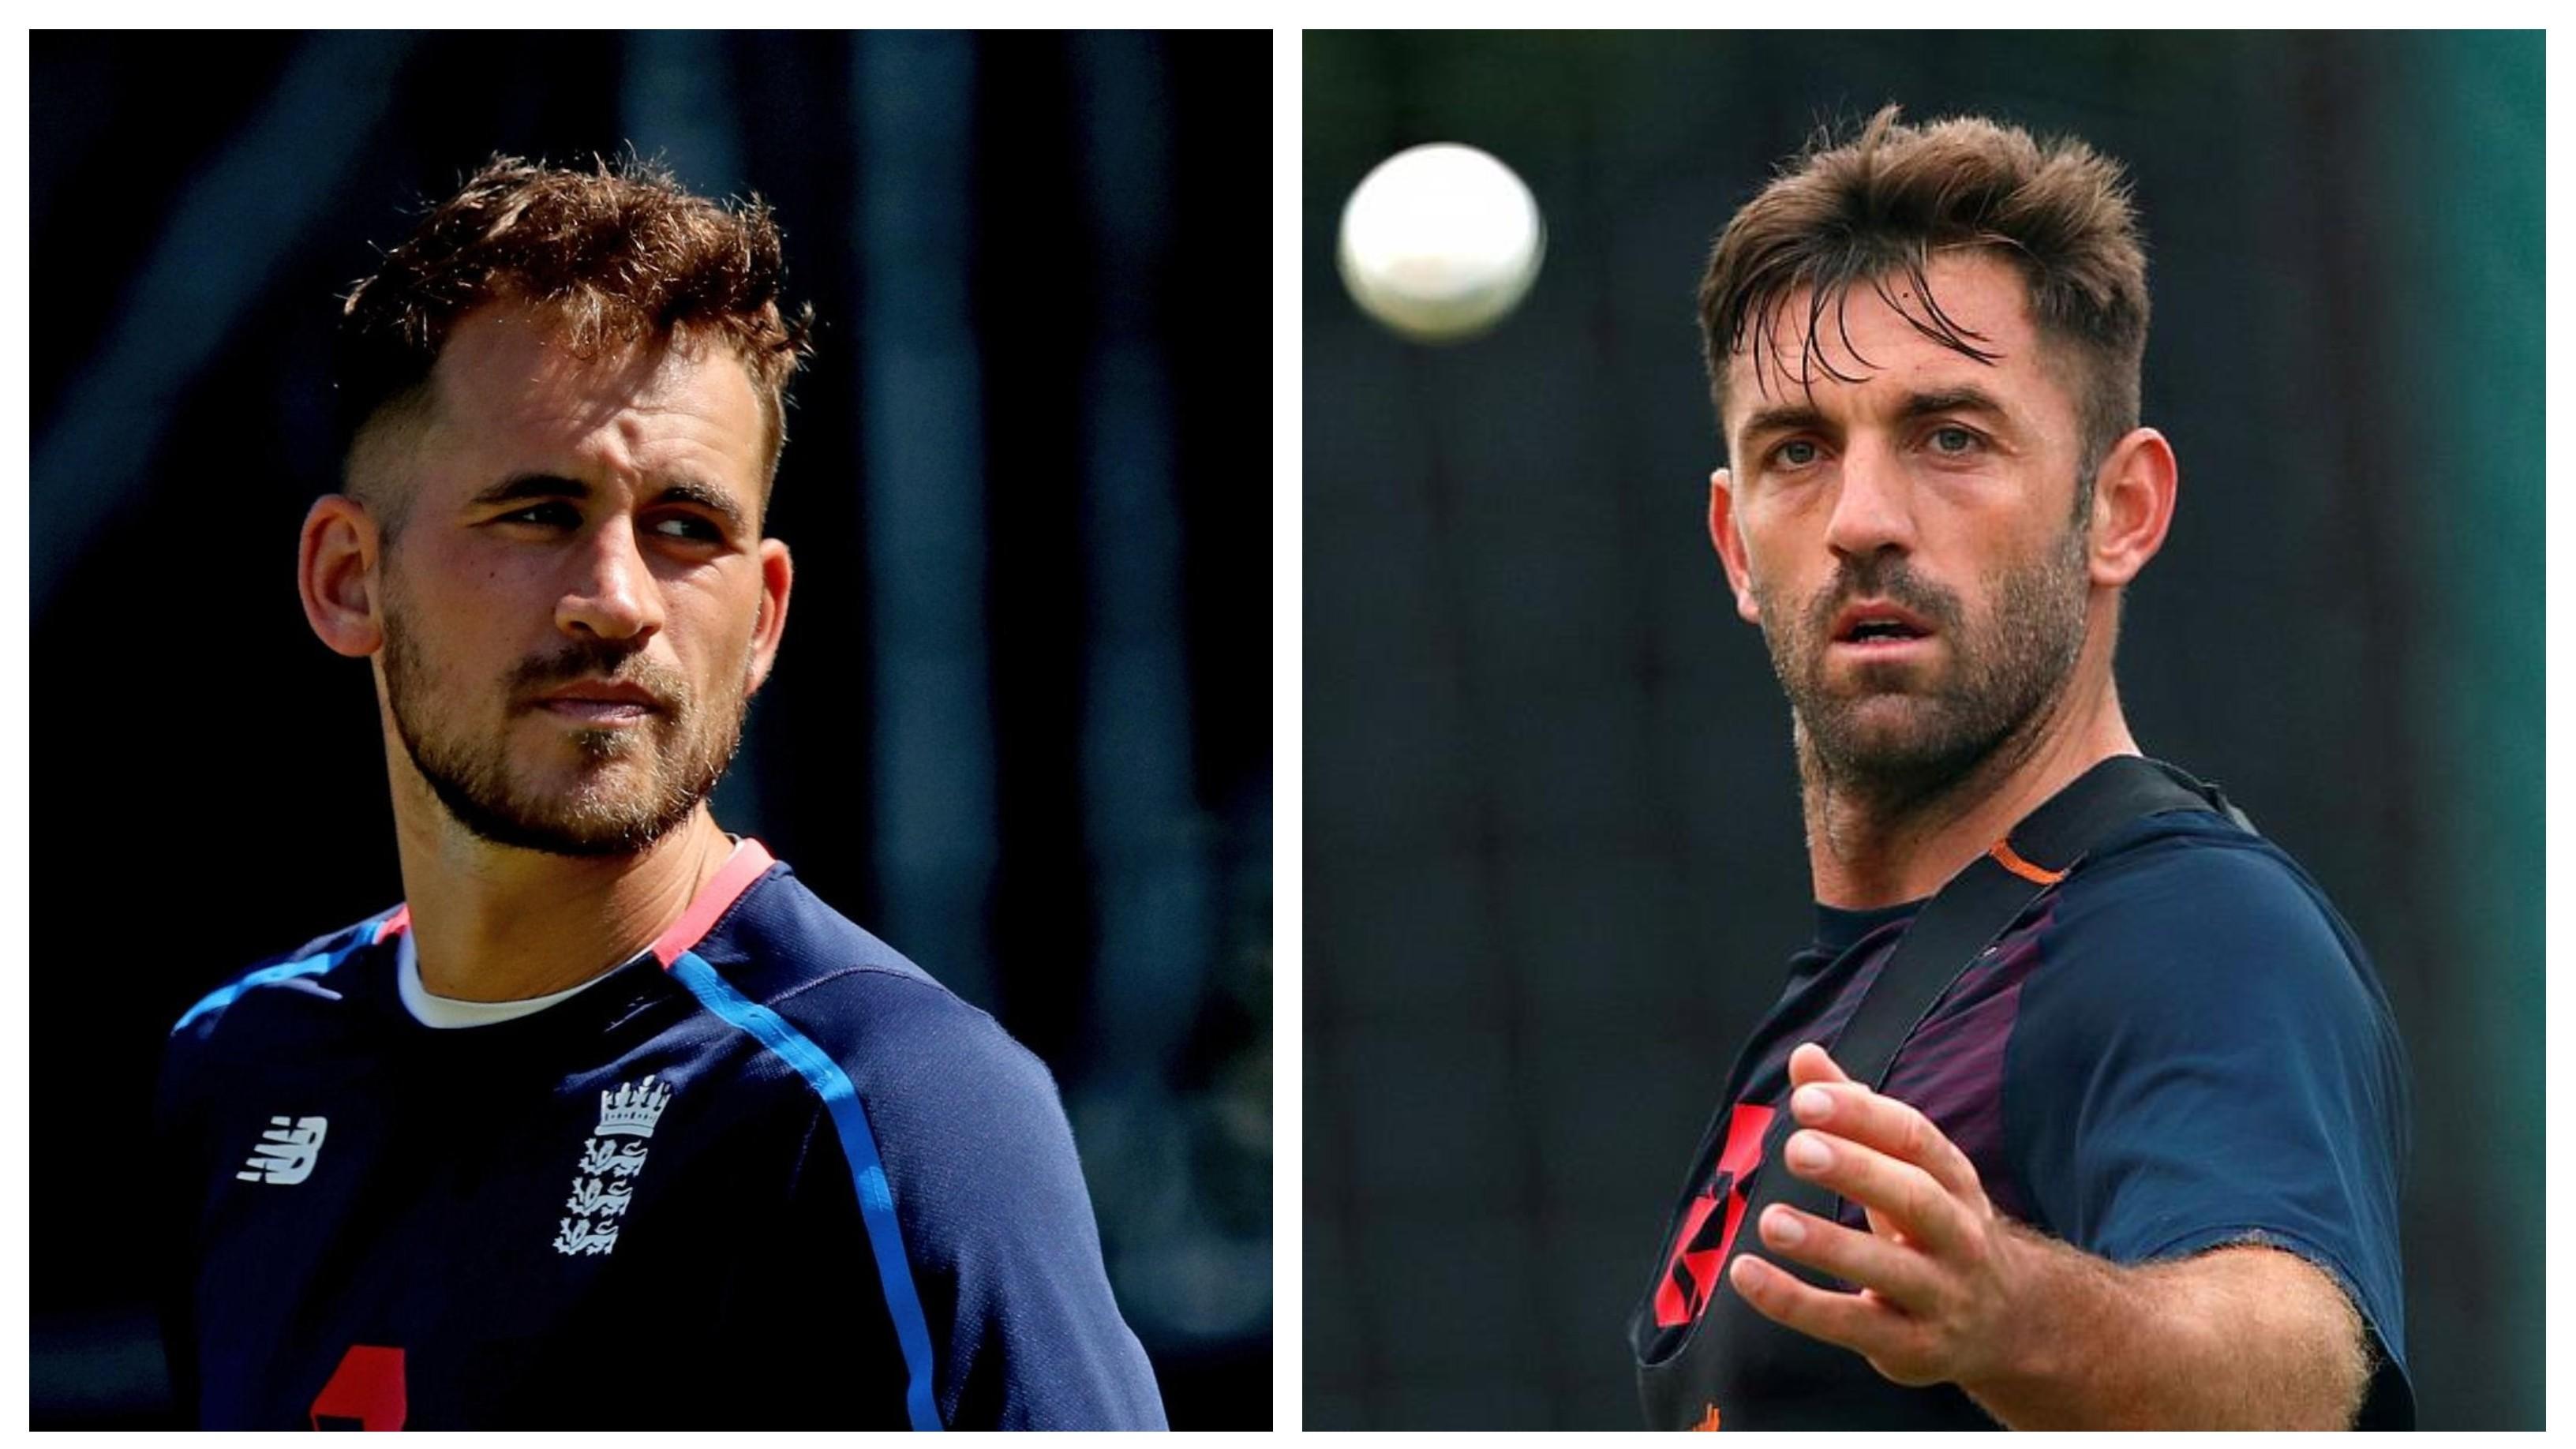 England announces 55-man training group; Alex Hales, Liam Plunkett not picked